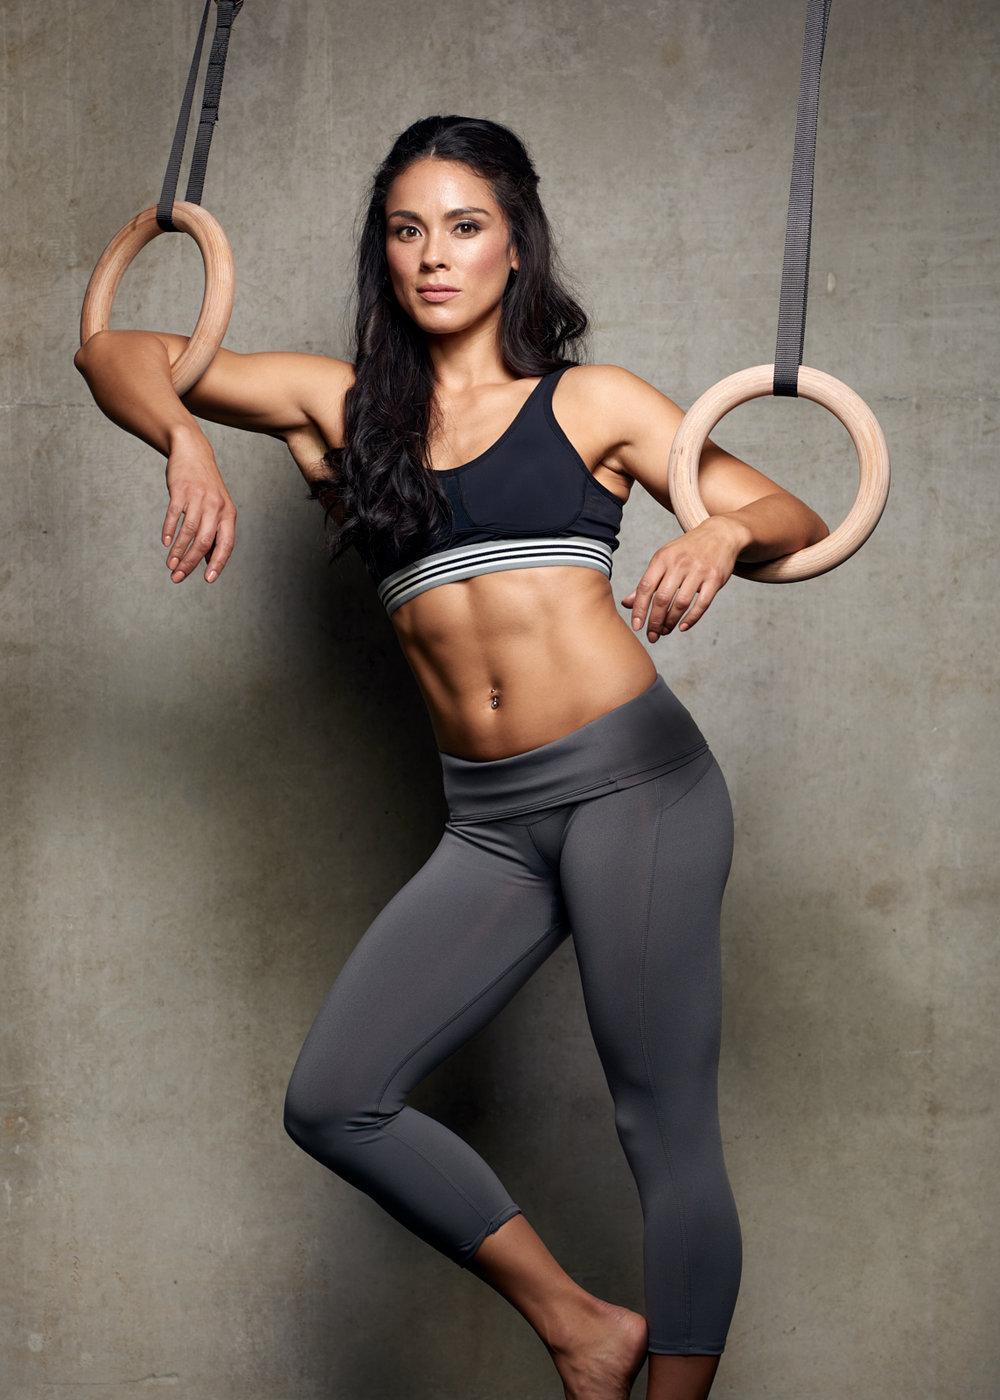 Fitness Photoshoot Carmel Rodriguez Vancouver.jpg